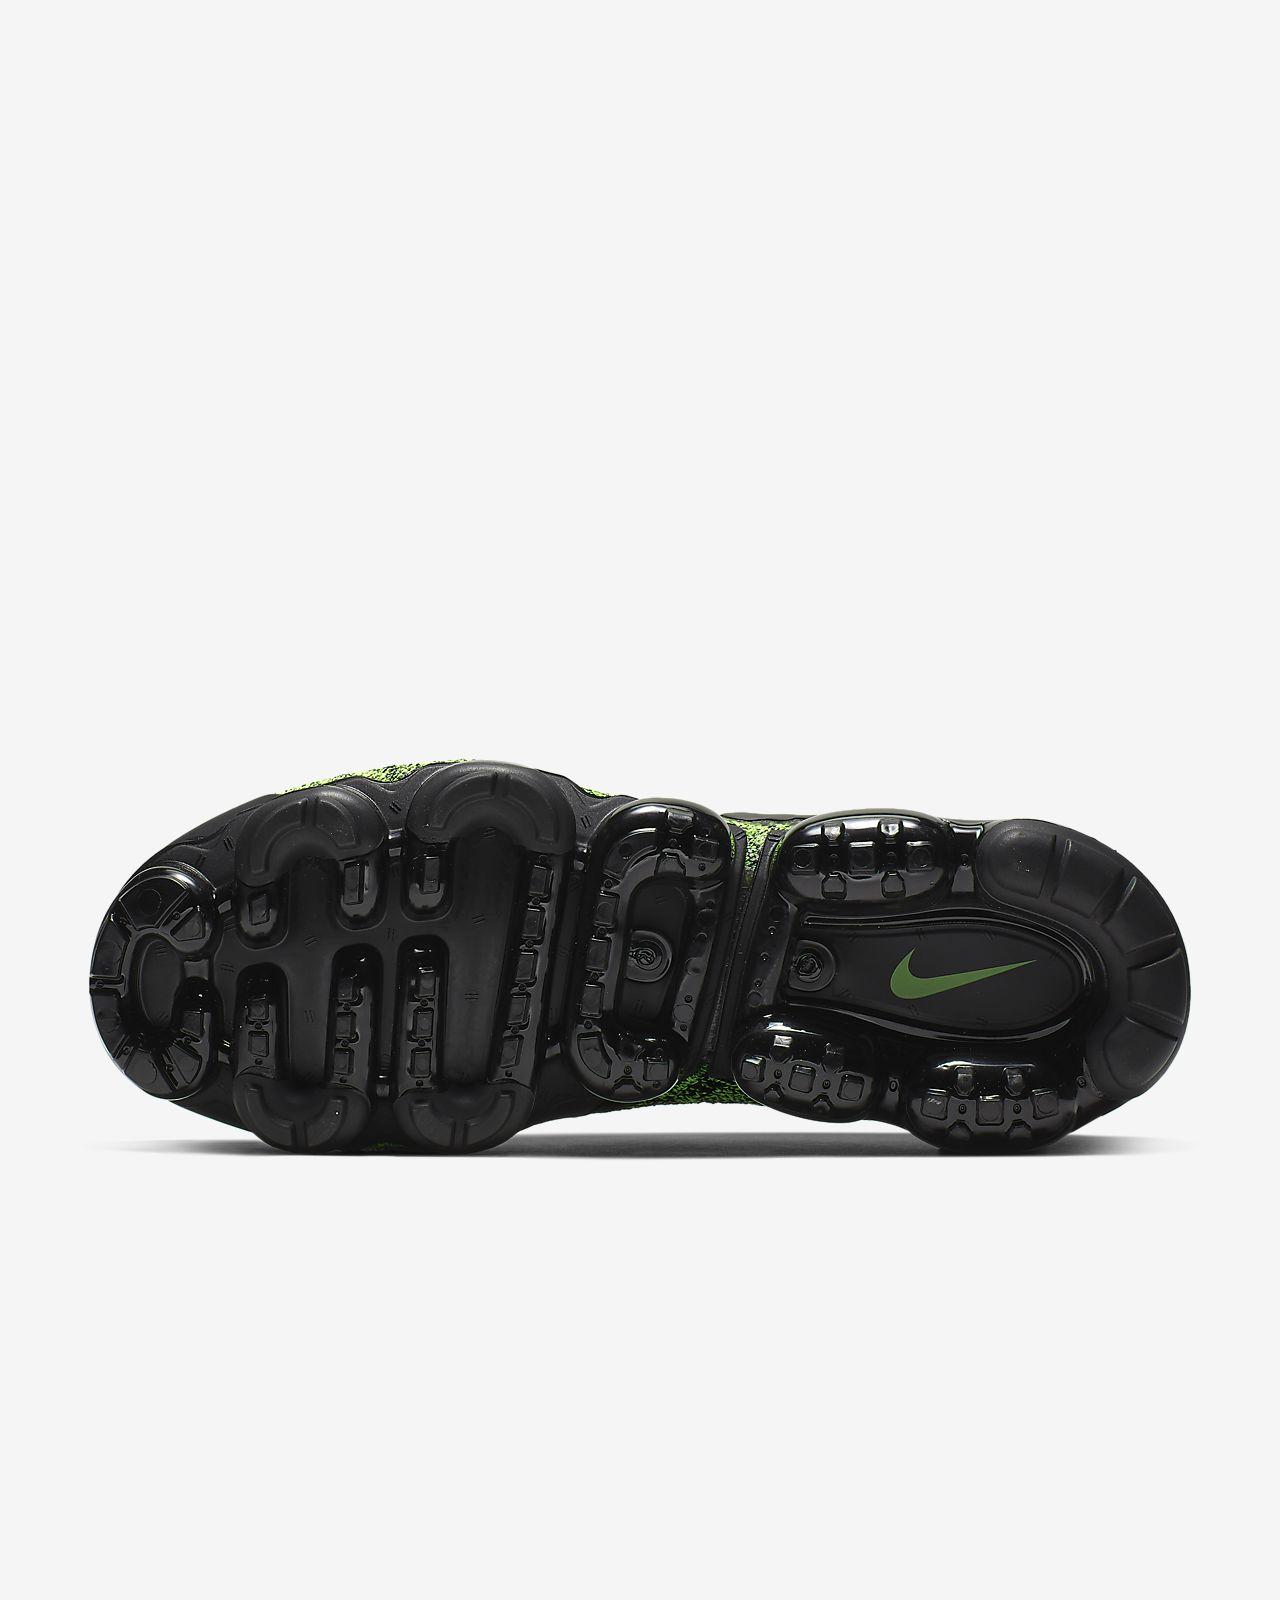 3064621abbb9 Nike Air VaporMax Flyknit 2 Shoe. Nike.com